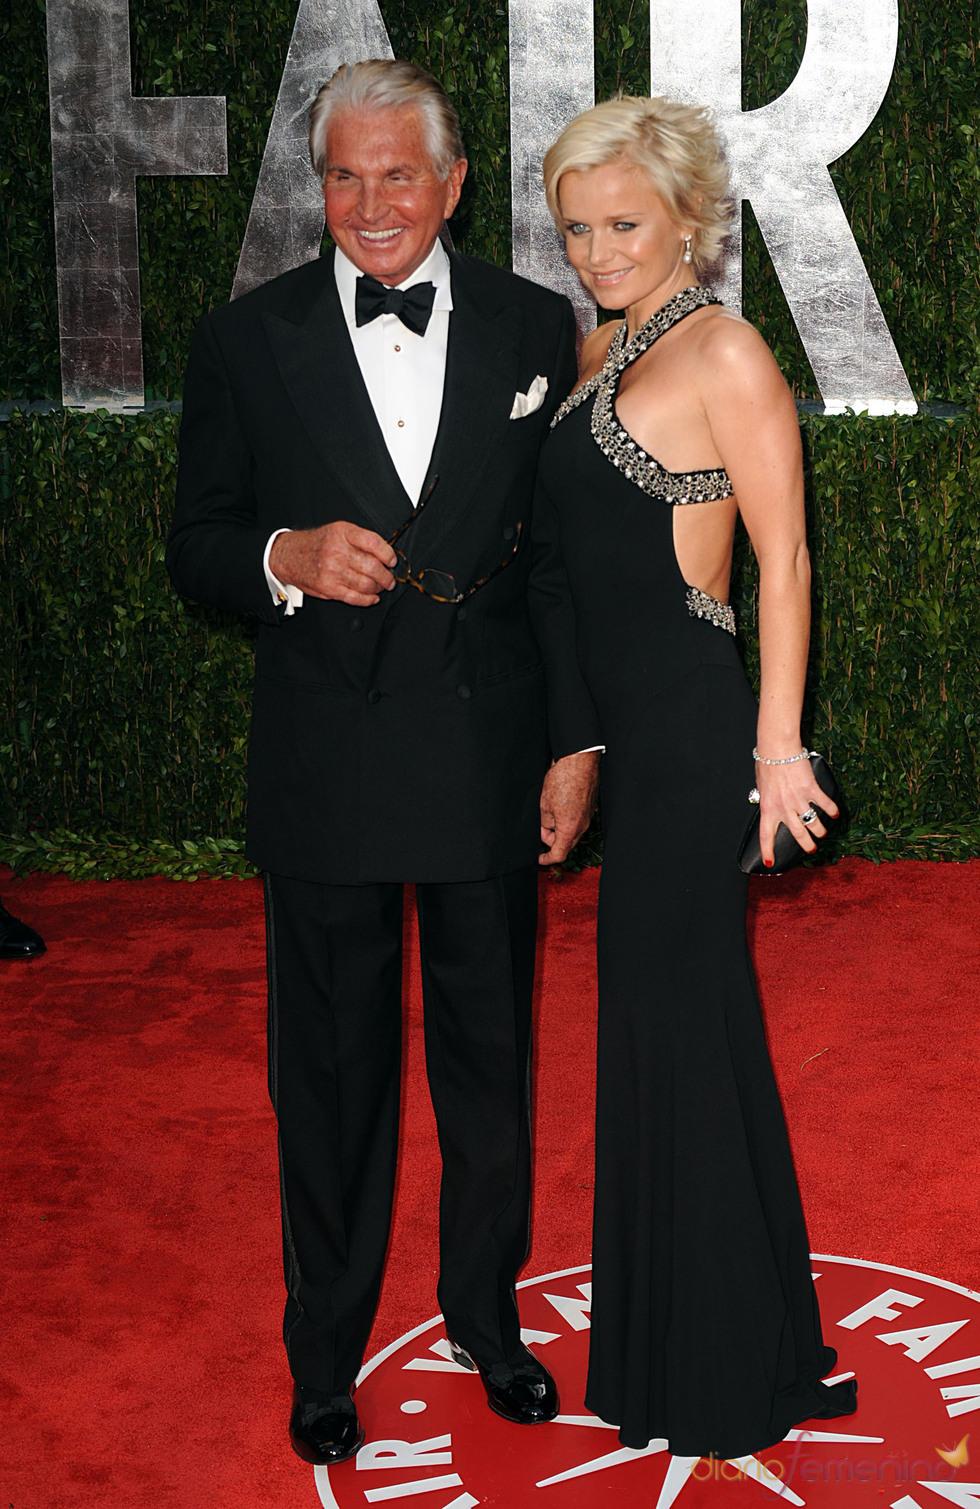 George Hamilton and Barbara Sturm en la fiesta Vanity Fair Oscar 2010